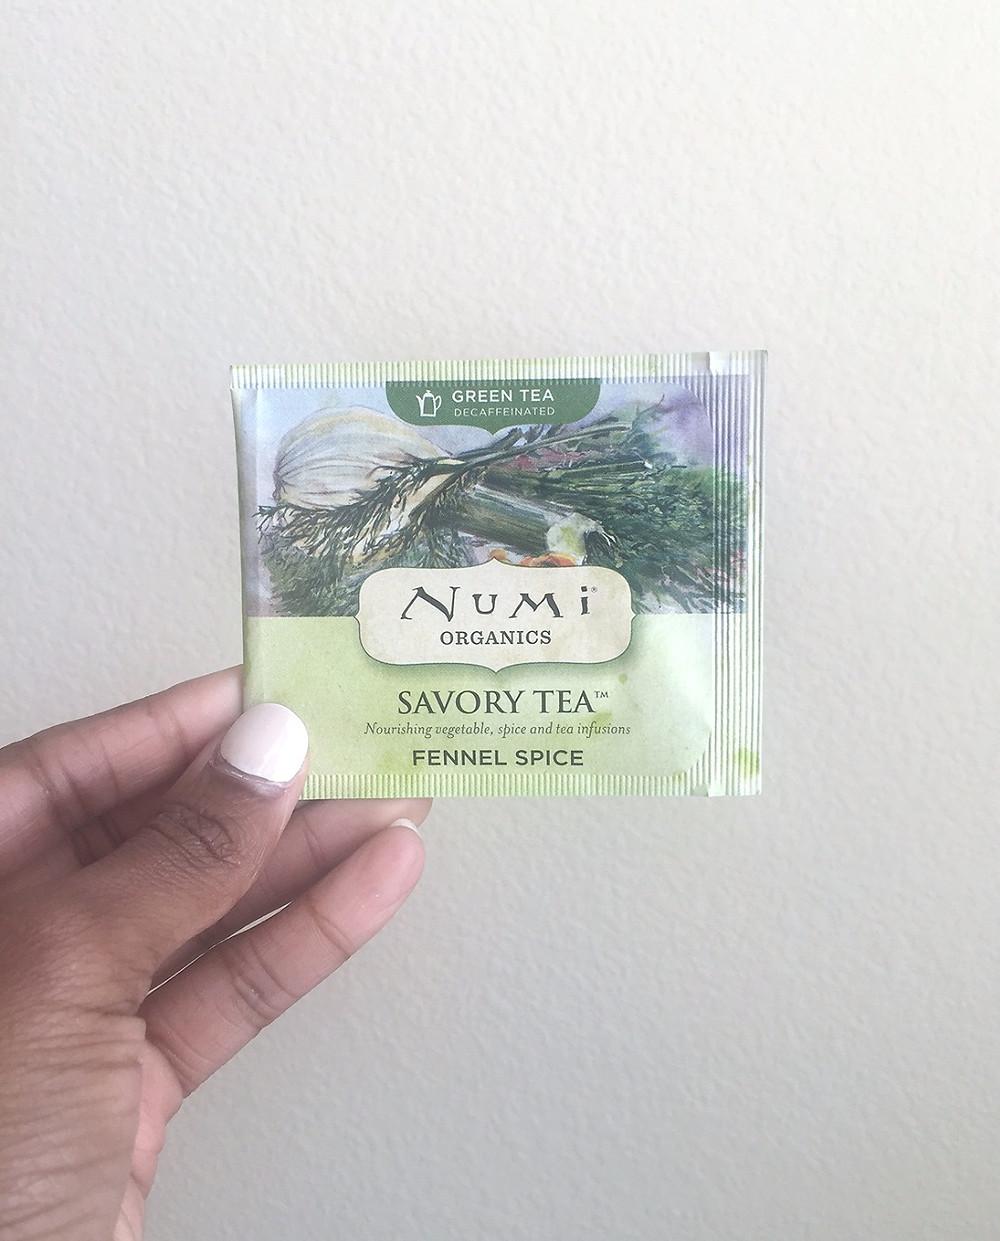 Numi Organics Savory Tea | Fennel Spice